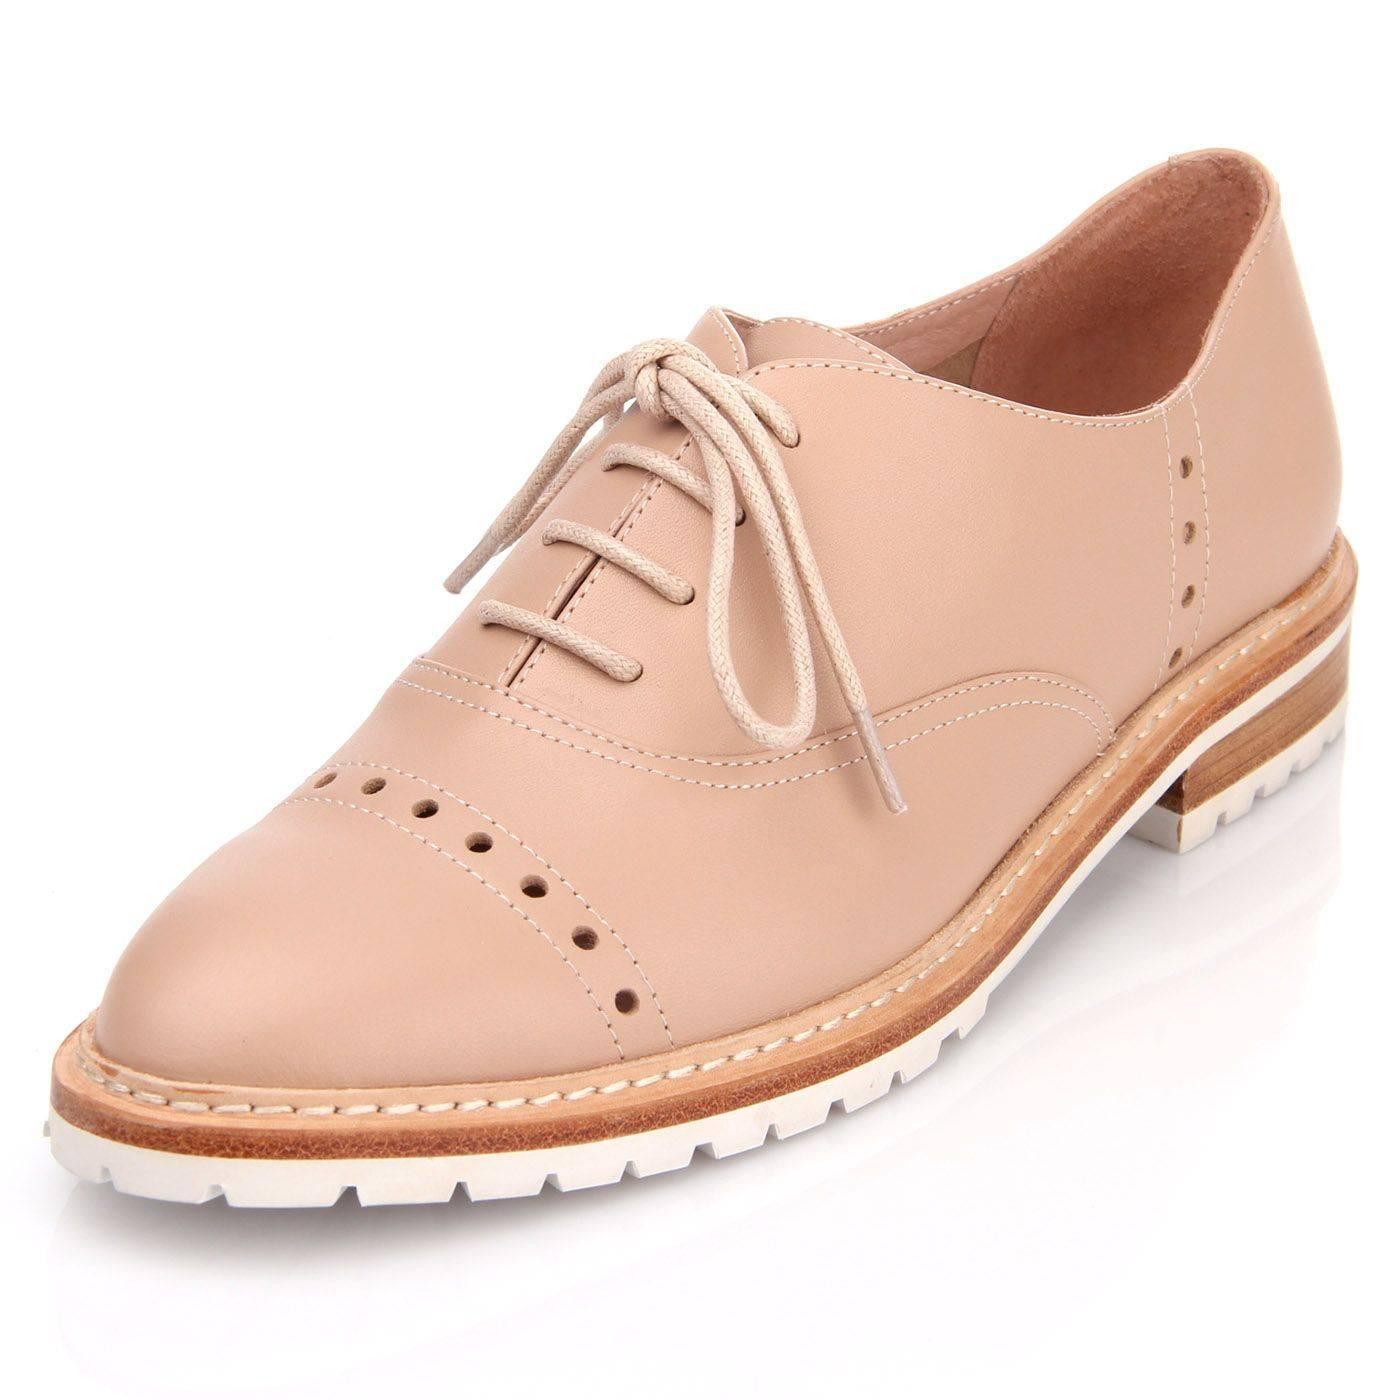 Туфли женские Basconi 4712 – фото 0ab4b107cc082